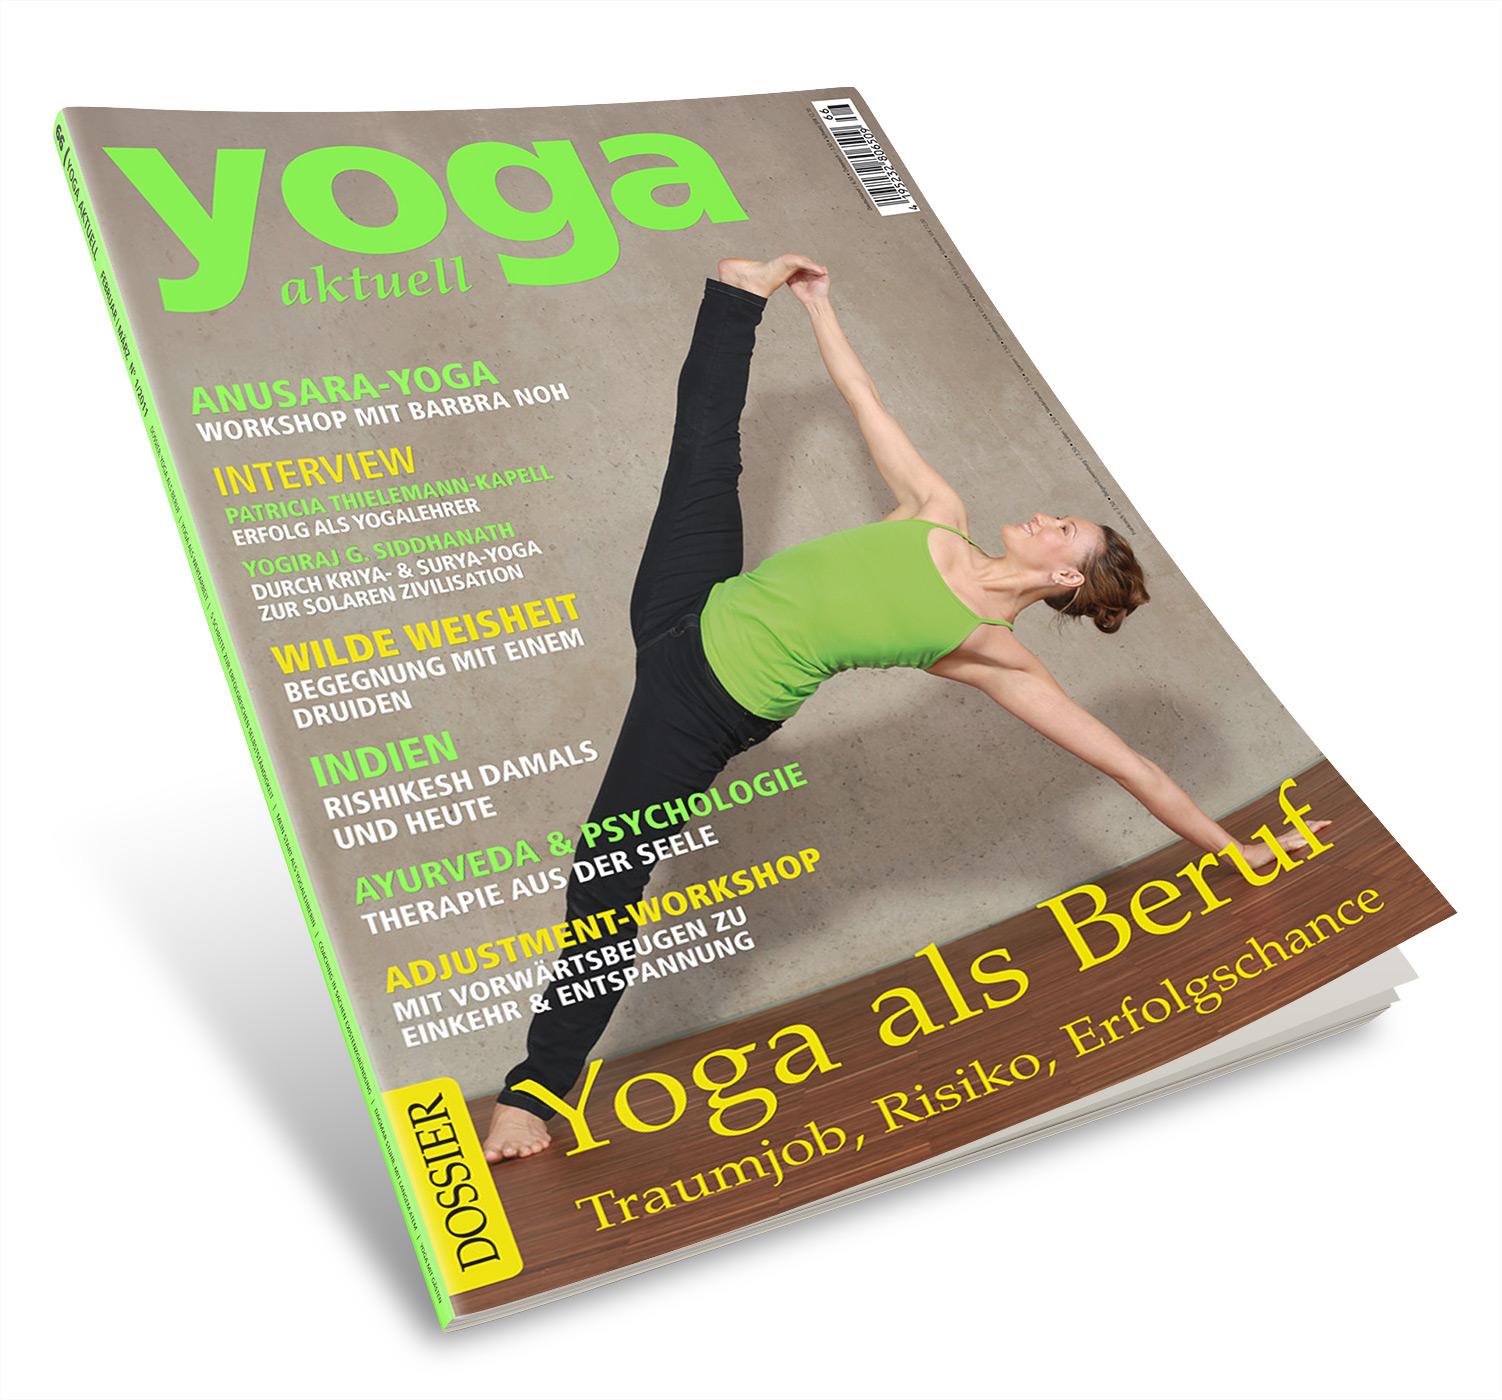 Yoga Aktuell 66 - 01/2011